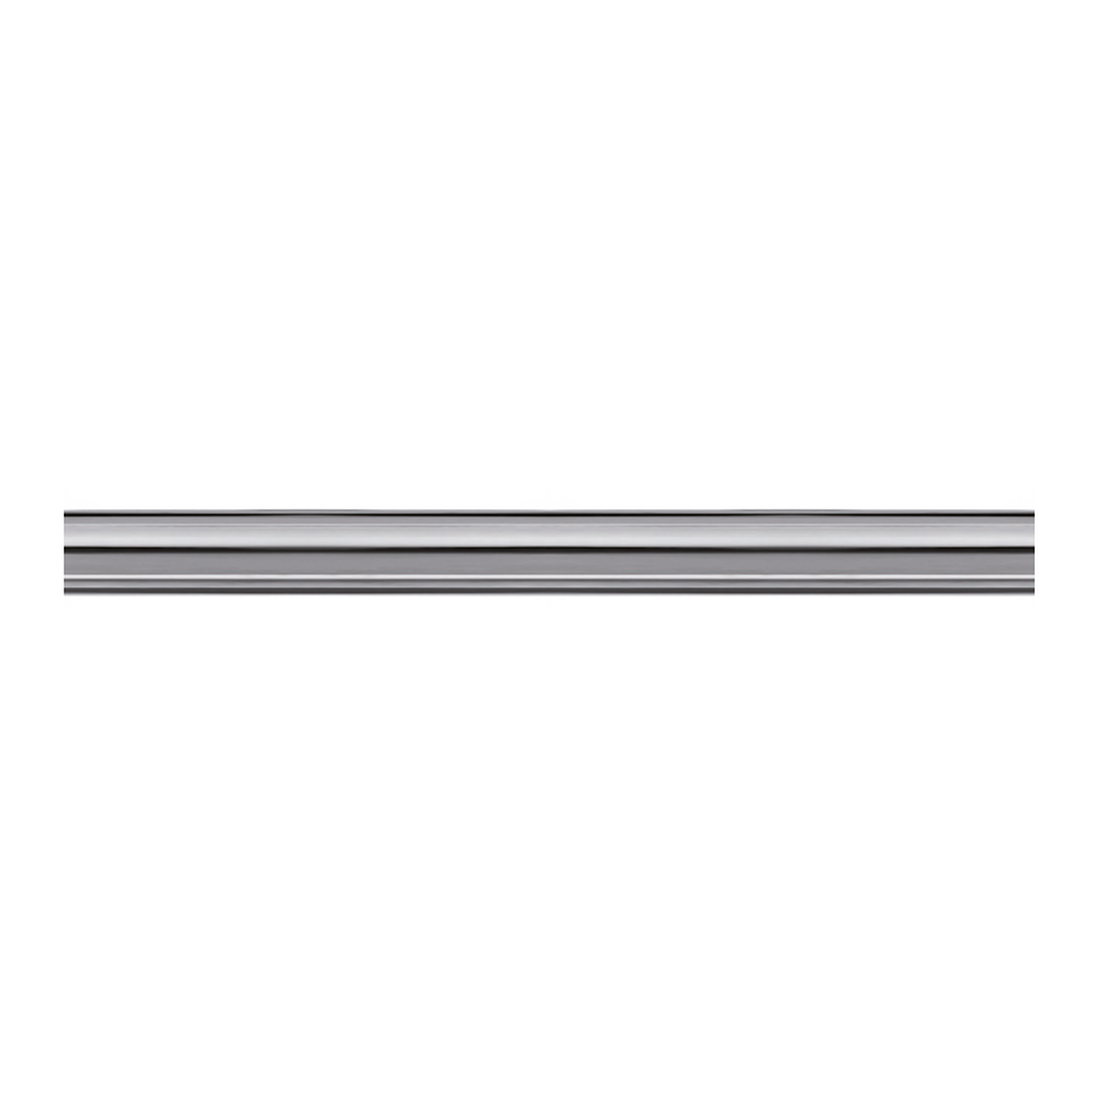 STABILIZATION SET, 1500MM, SATIN STAINLESS STEEL